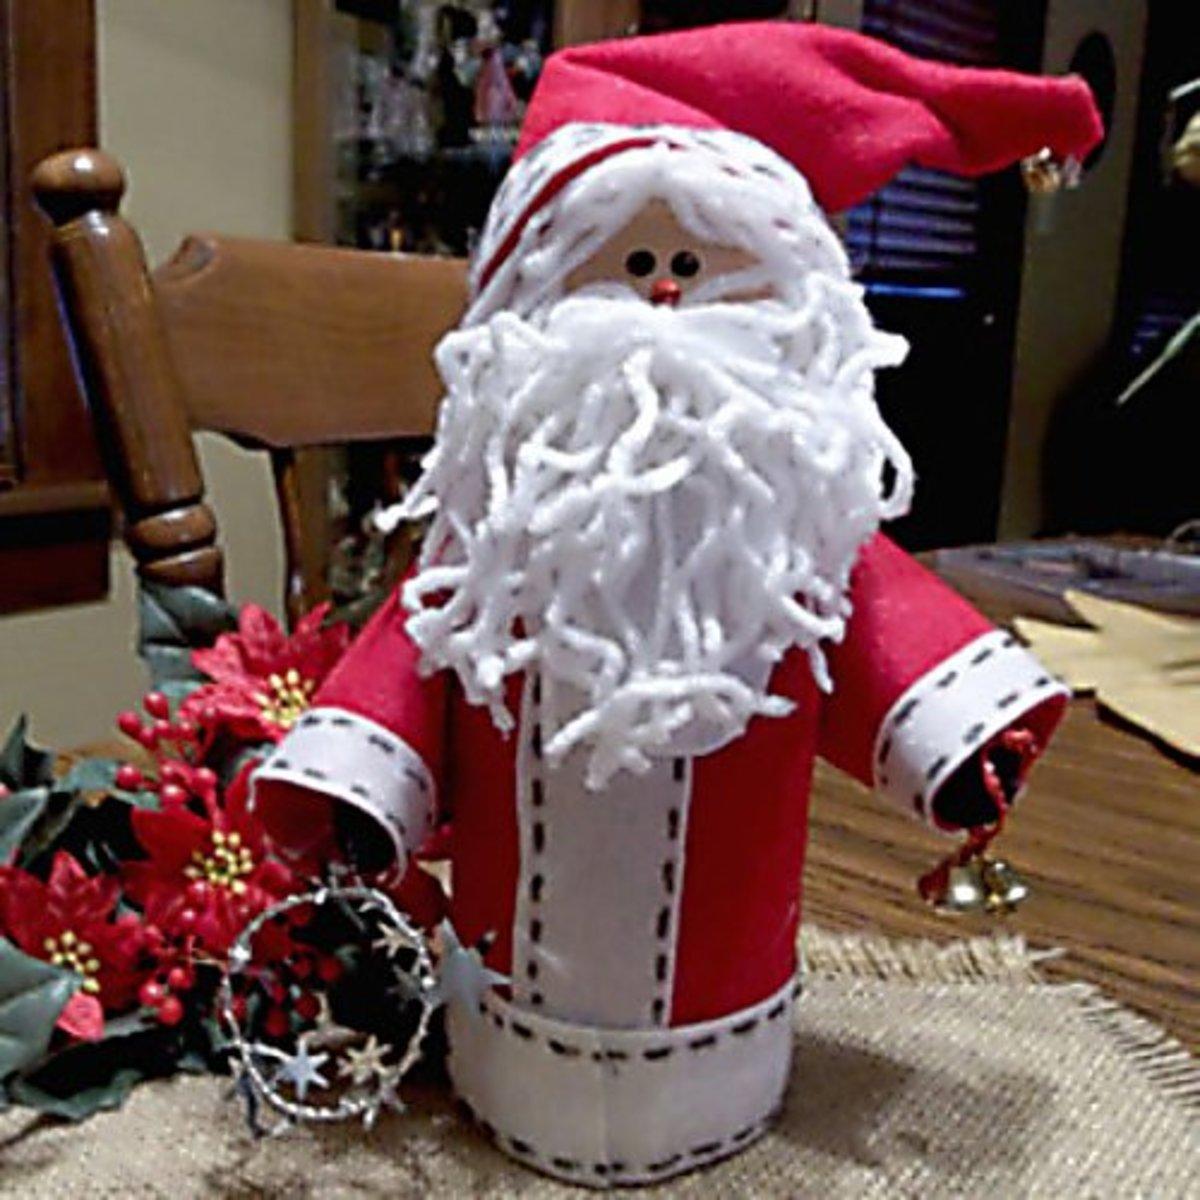 Santa Craft From Creamer Bottle | Holidappy